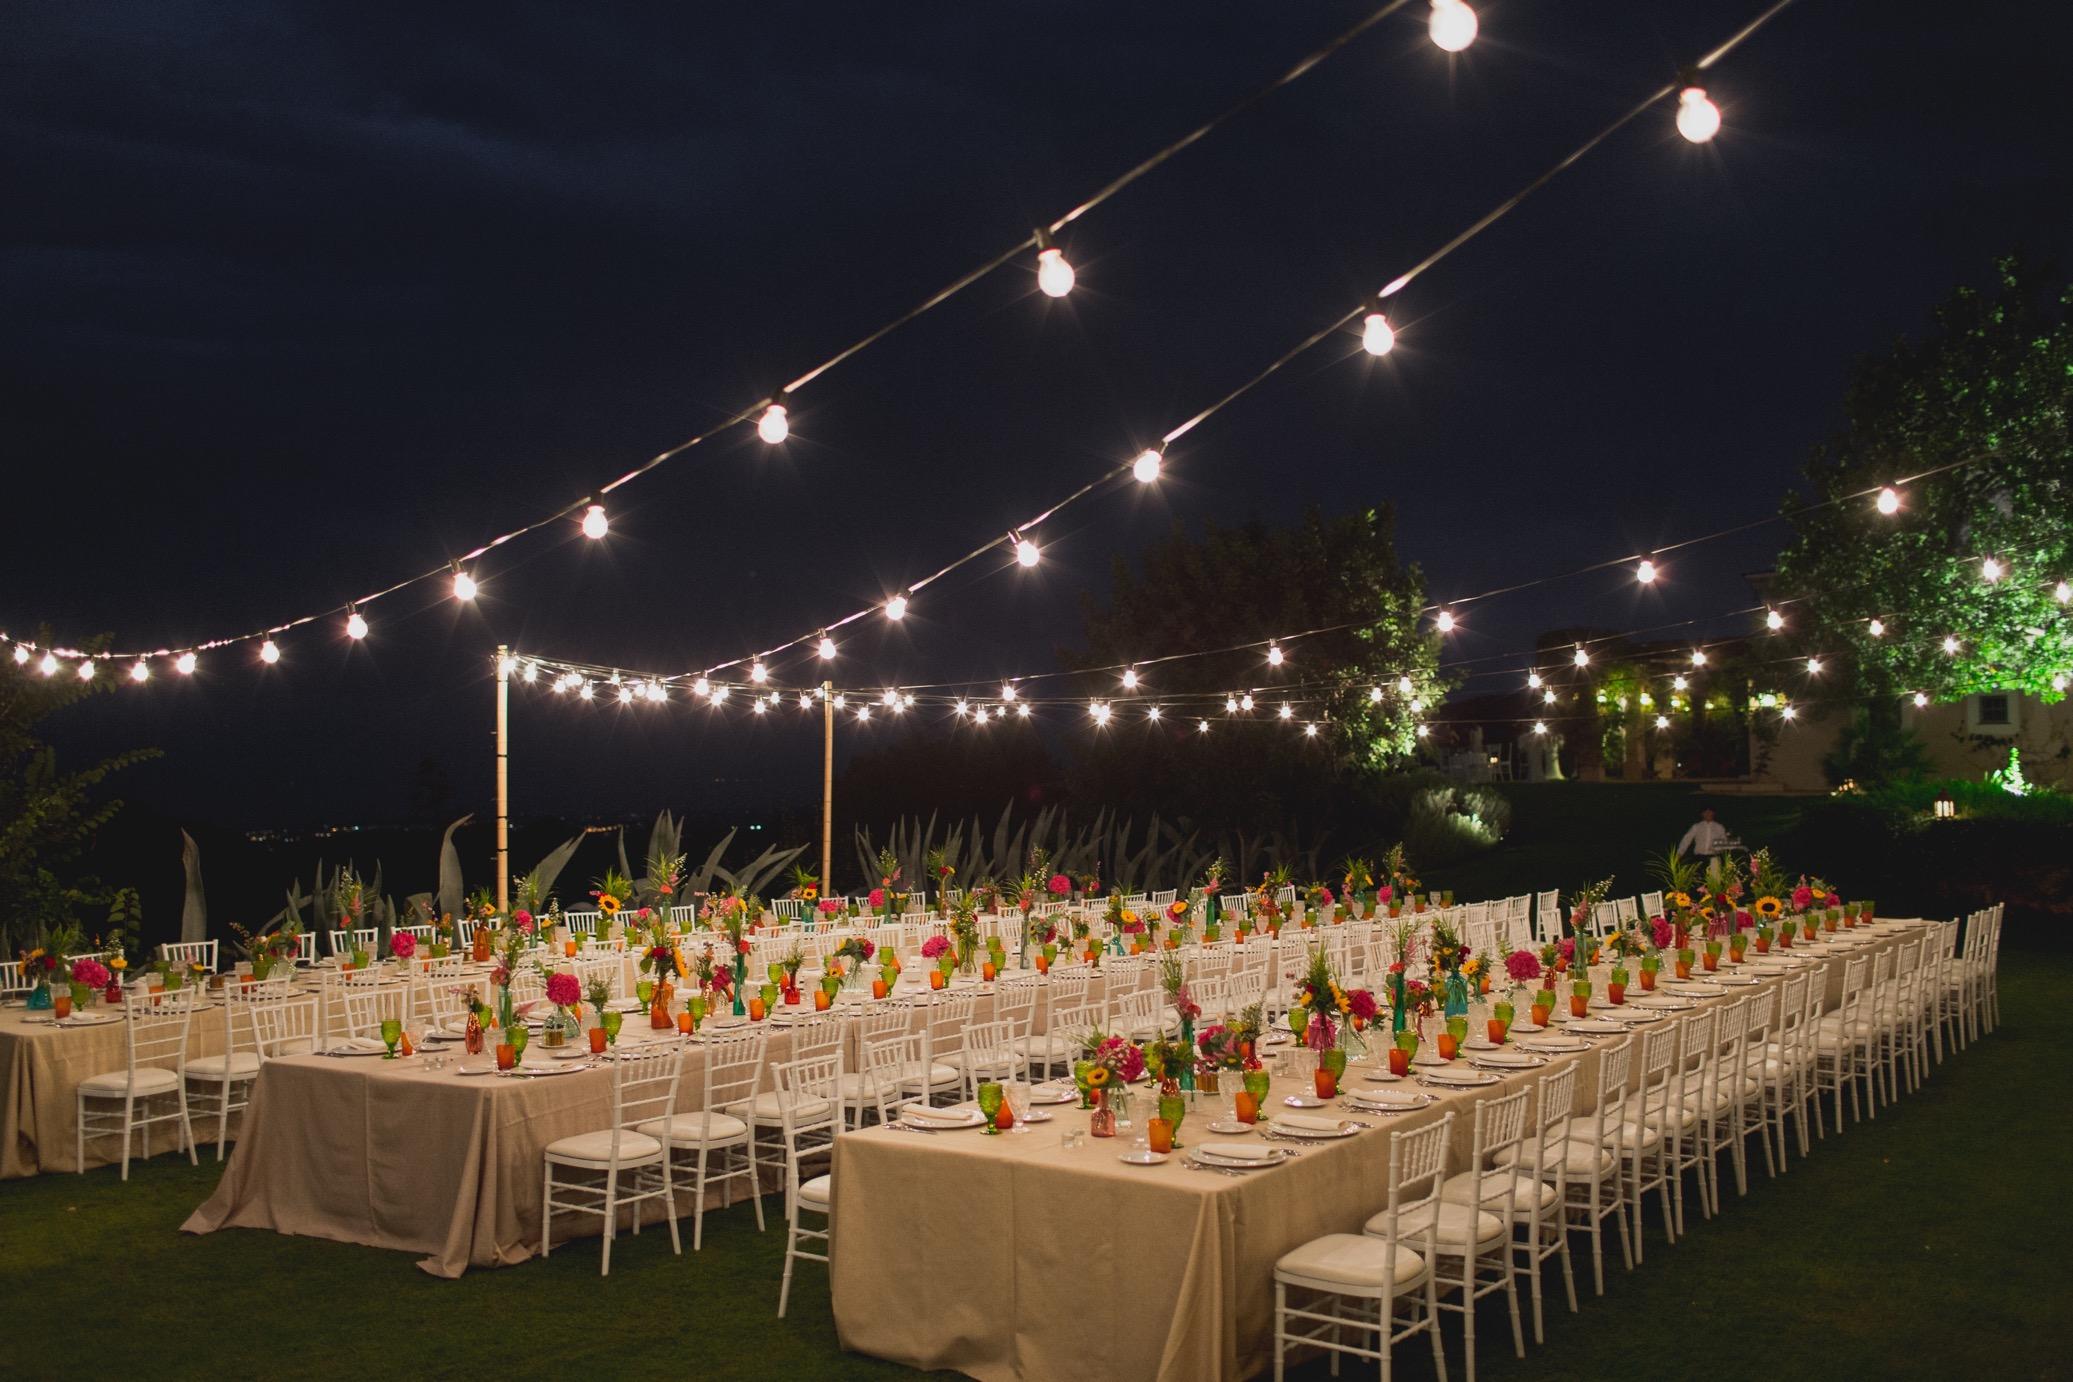 Si-Quiero-Wedding-Planner-By-Sira-Antequera-Bodas-Málaga-Marbella-Miami- PATRICIA-JUANLU-003